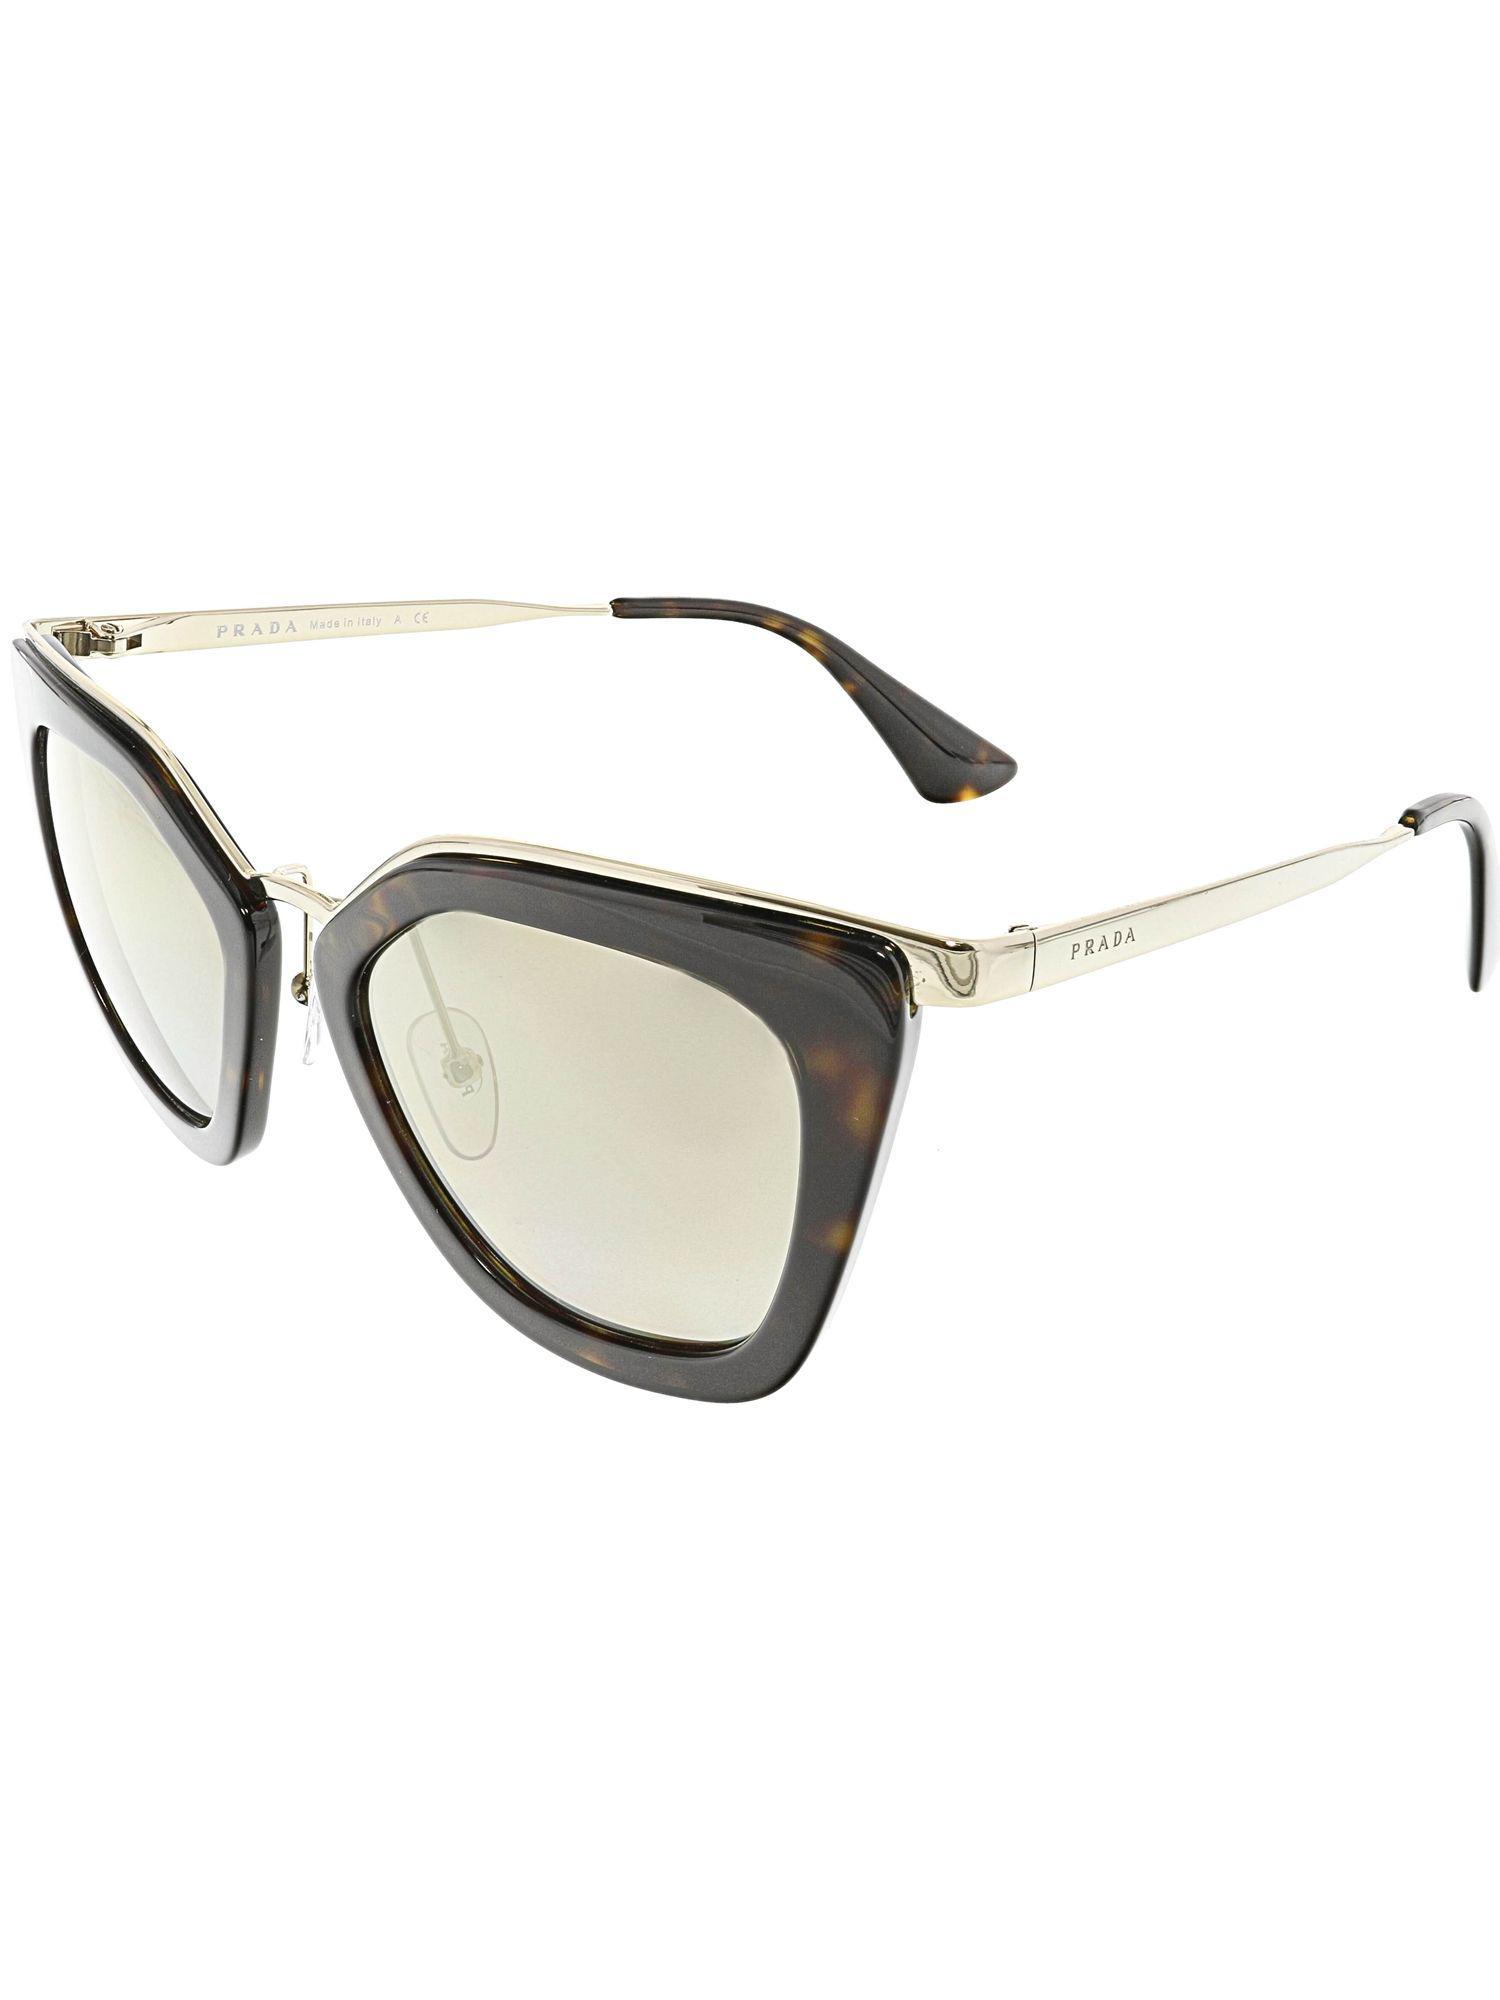 11410885aa882 Prada - Women s Gradient Pr53ss-2au6o0-52 Brown Butterfly Sunglasses - Lyst.  View fullscreen